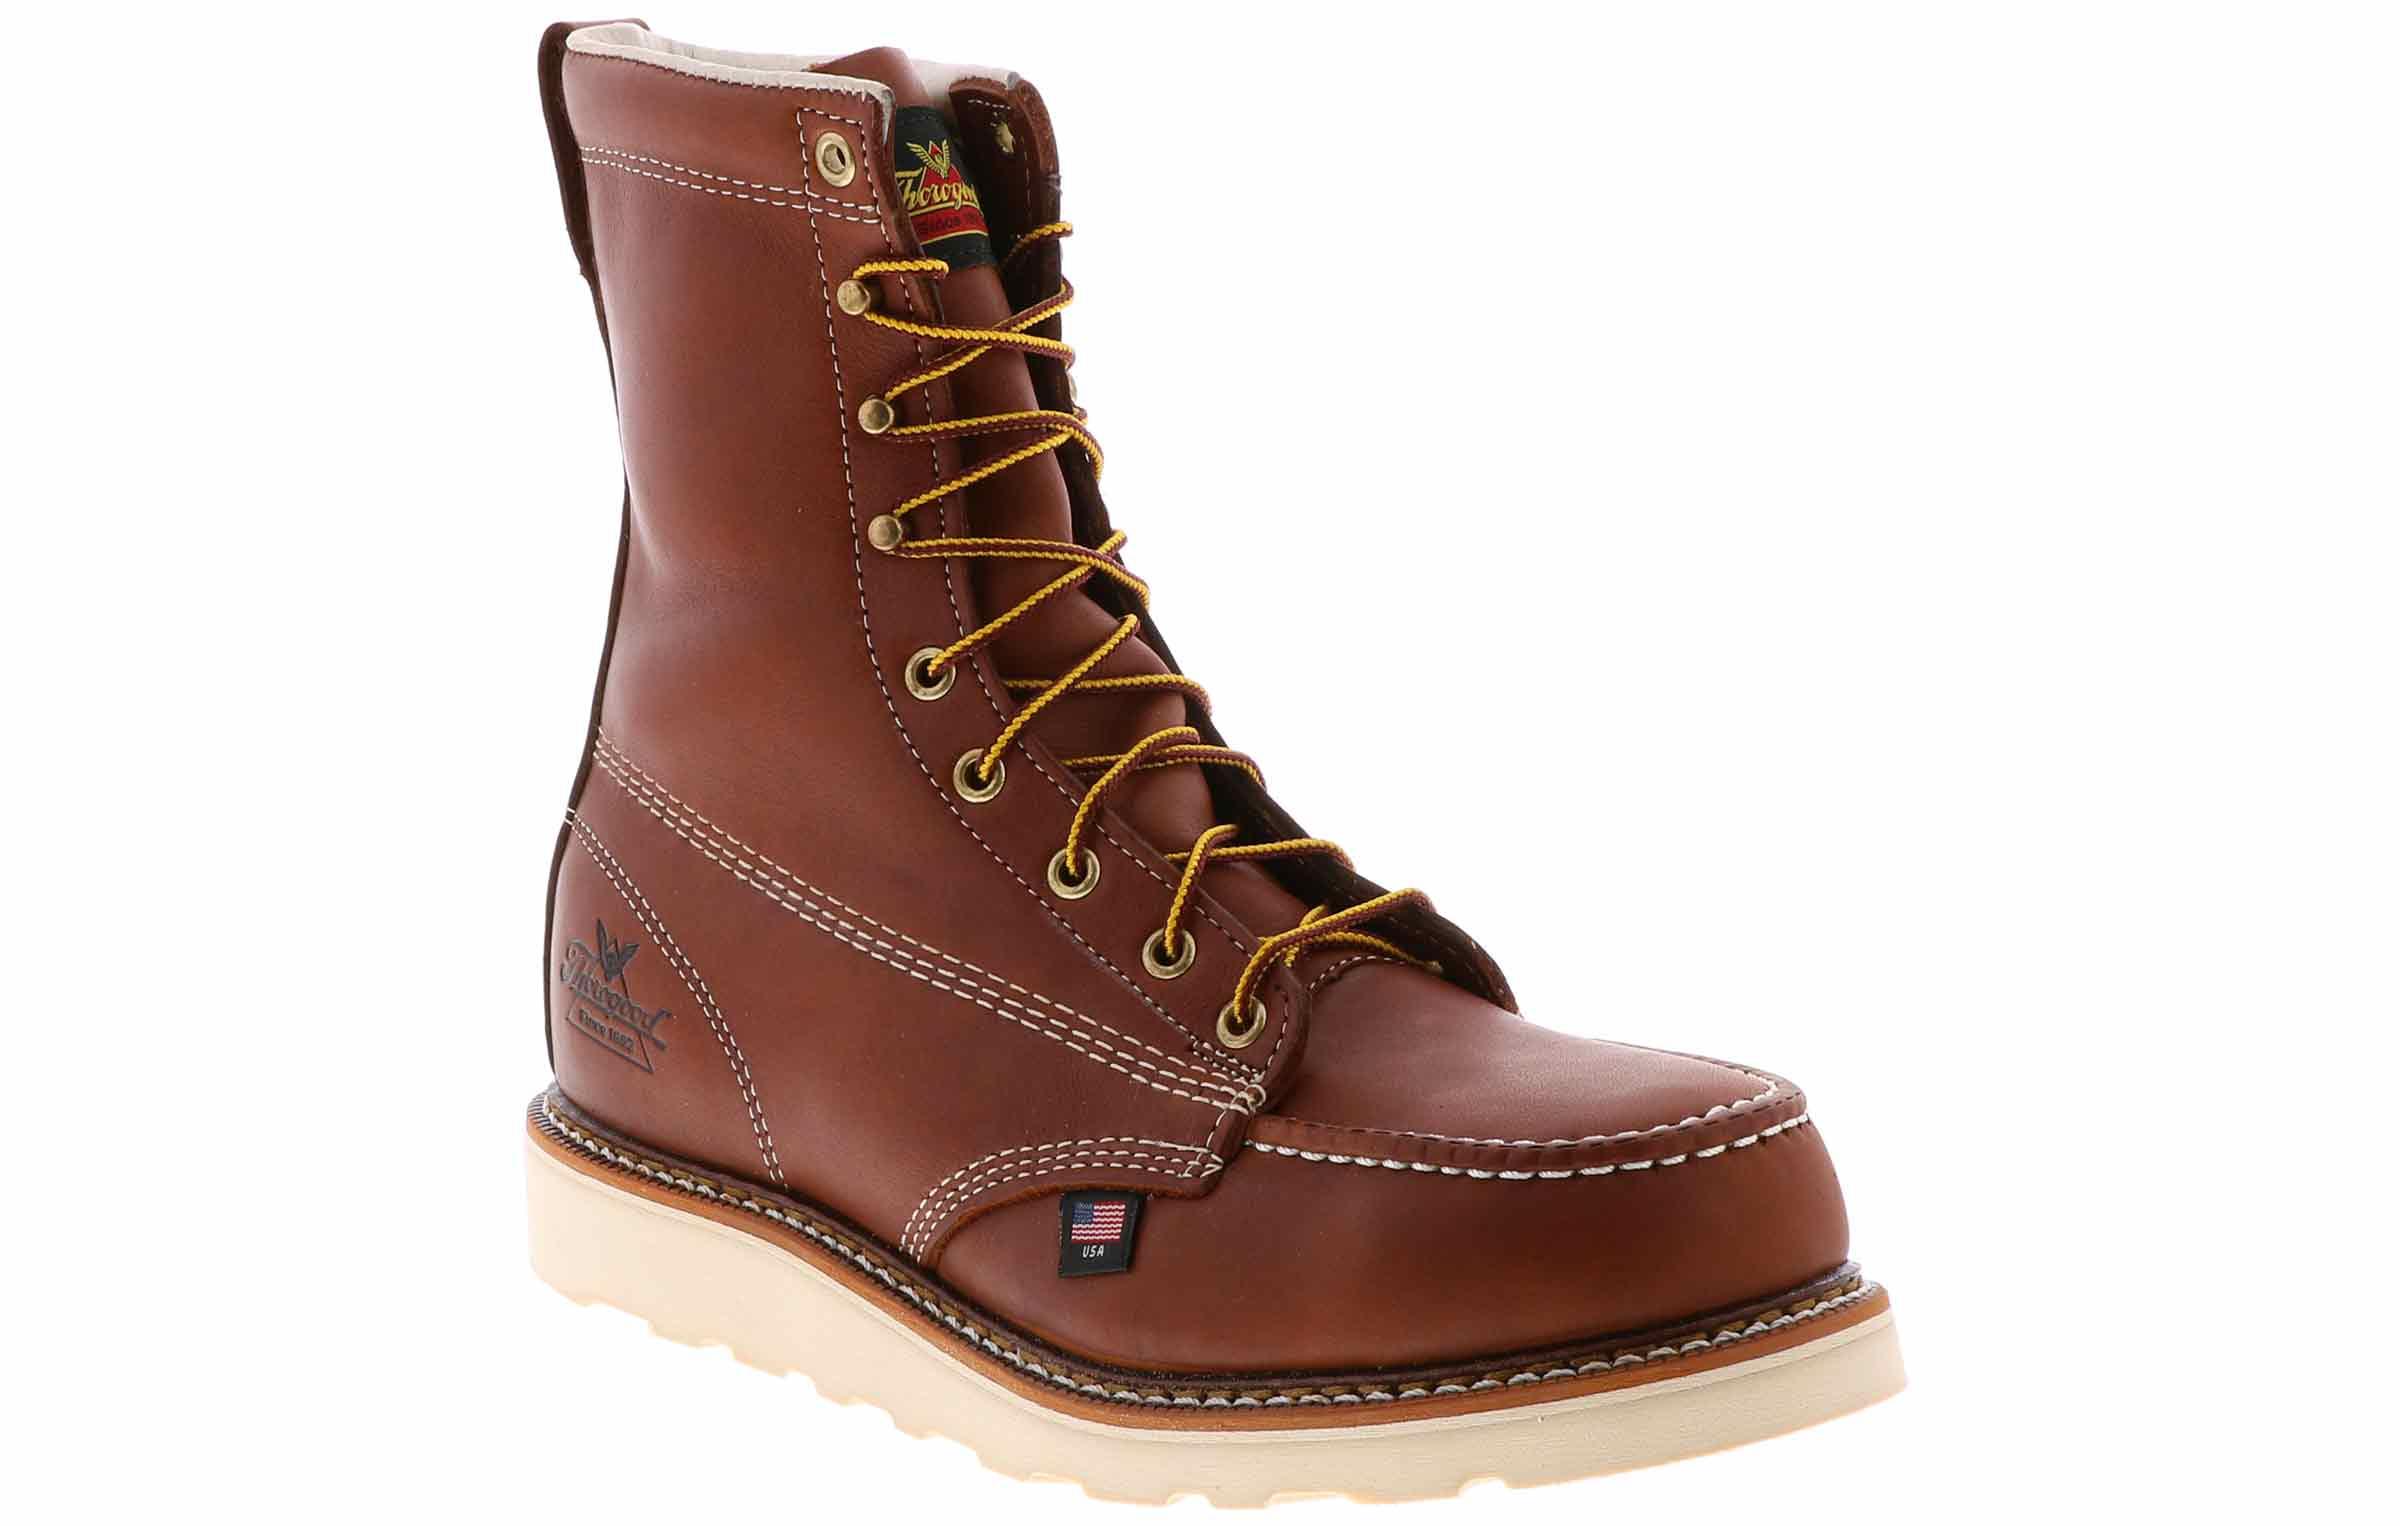 aea361b5fb7 Men's Thorogood American Heritage Safety Toe